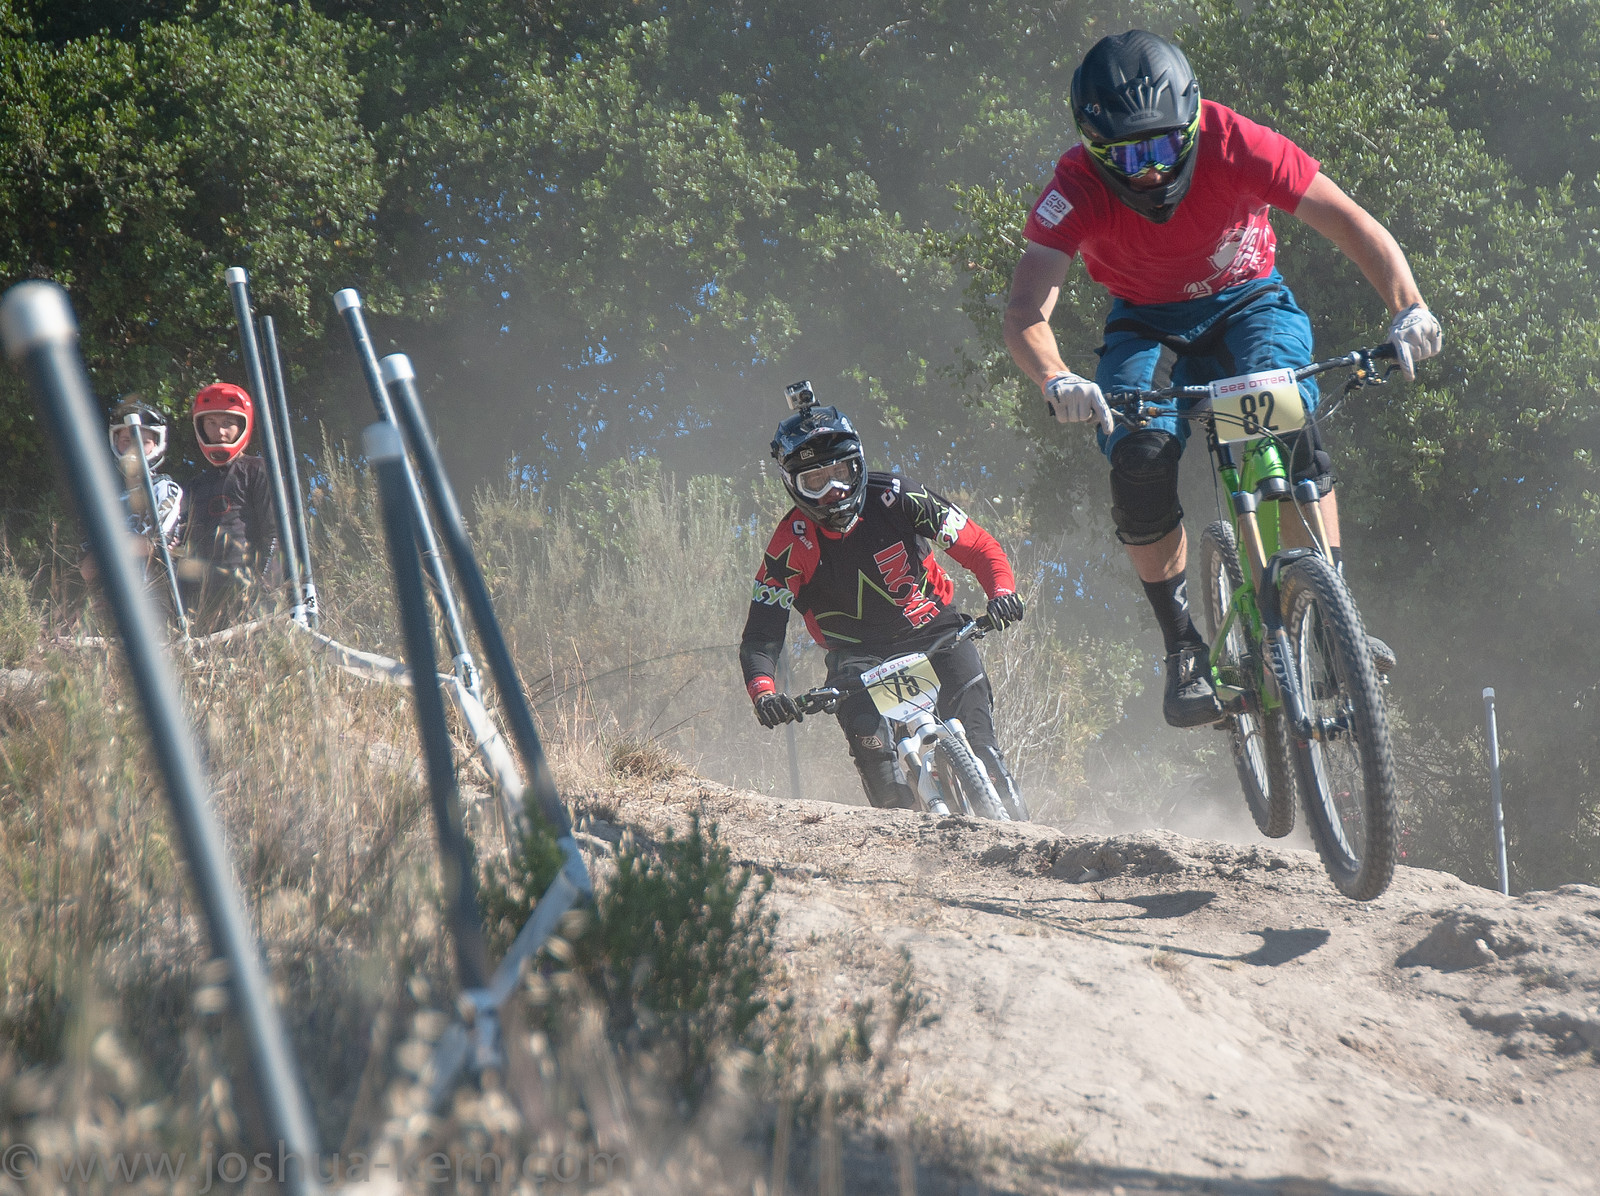 4-19-13DHPractice (18 of 36) - jkern620 - Mountain Biking Pictures - Vital MTB